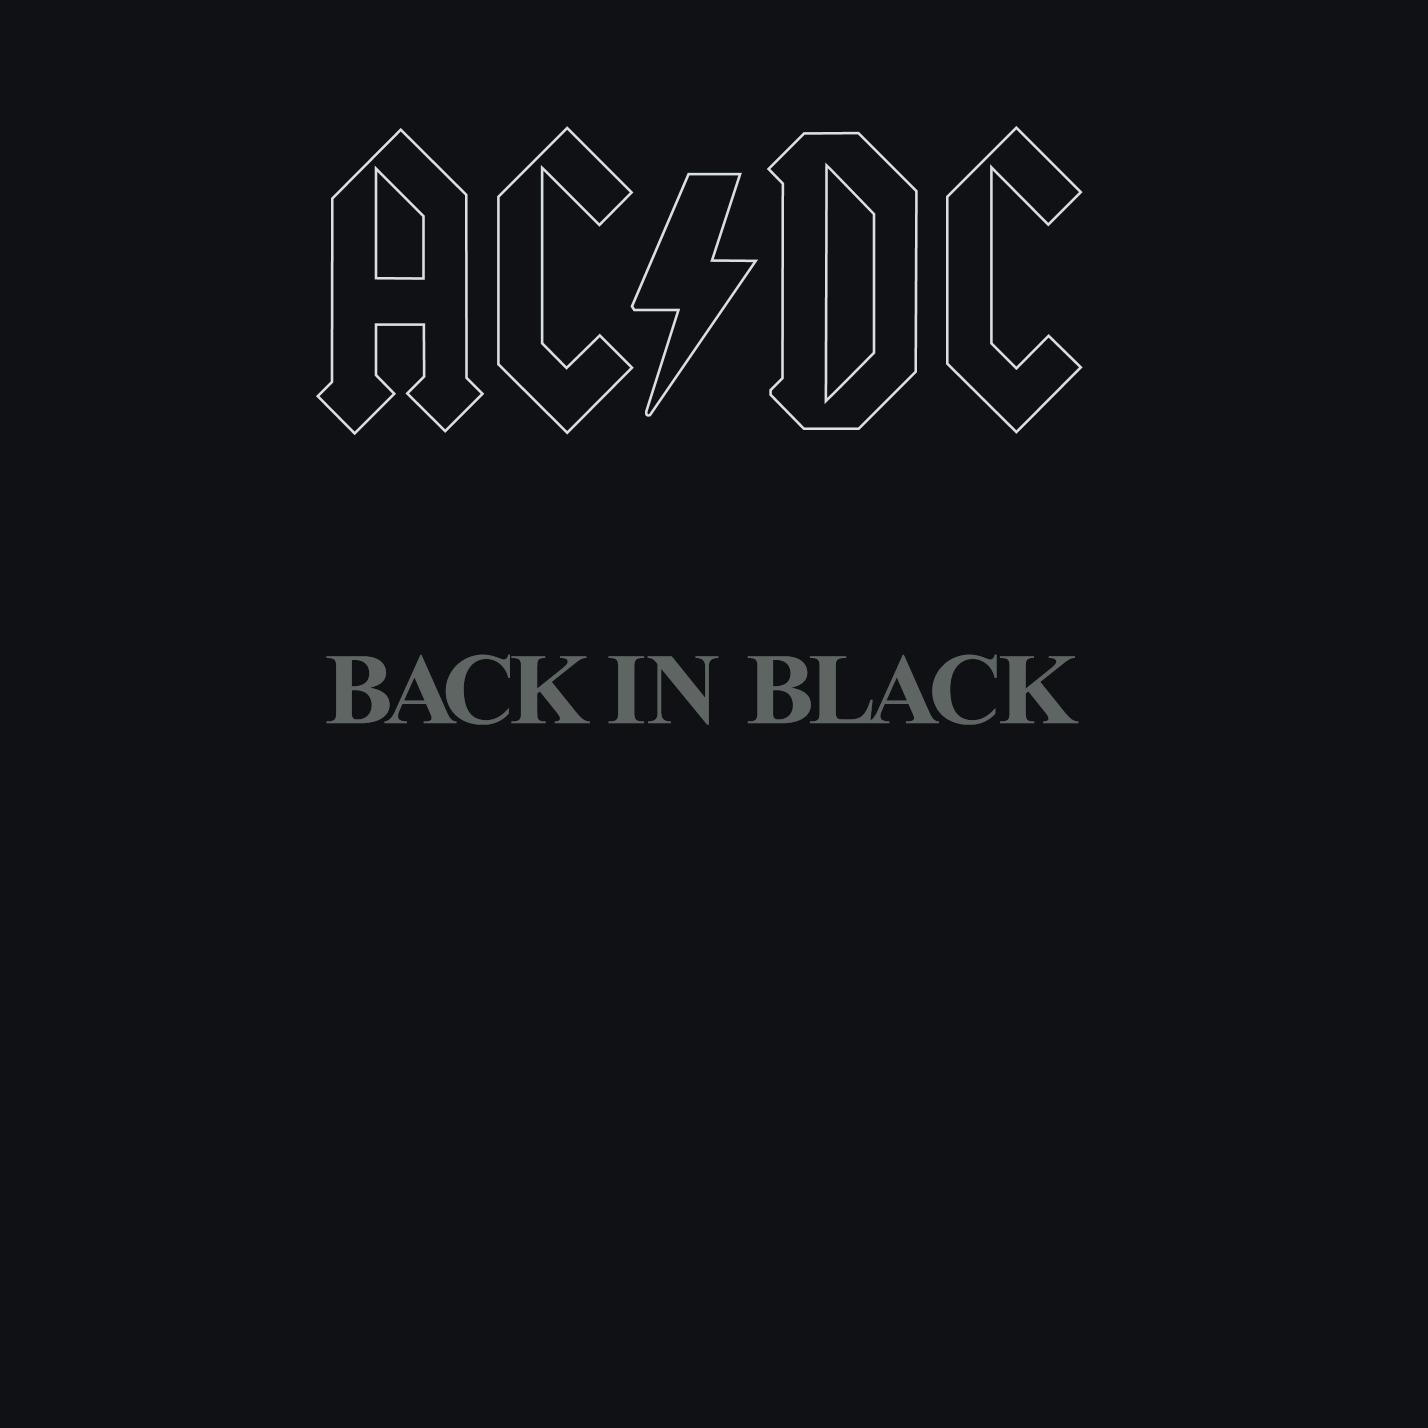 AC/DC (エーシー・ディーシー) 6thアルバム『BACK IN BLACK (バック・イン・ブラック)』(1980年7月25日発売) 高画質CDジャケット画像